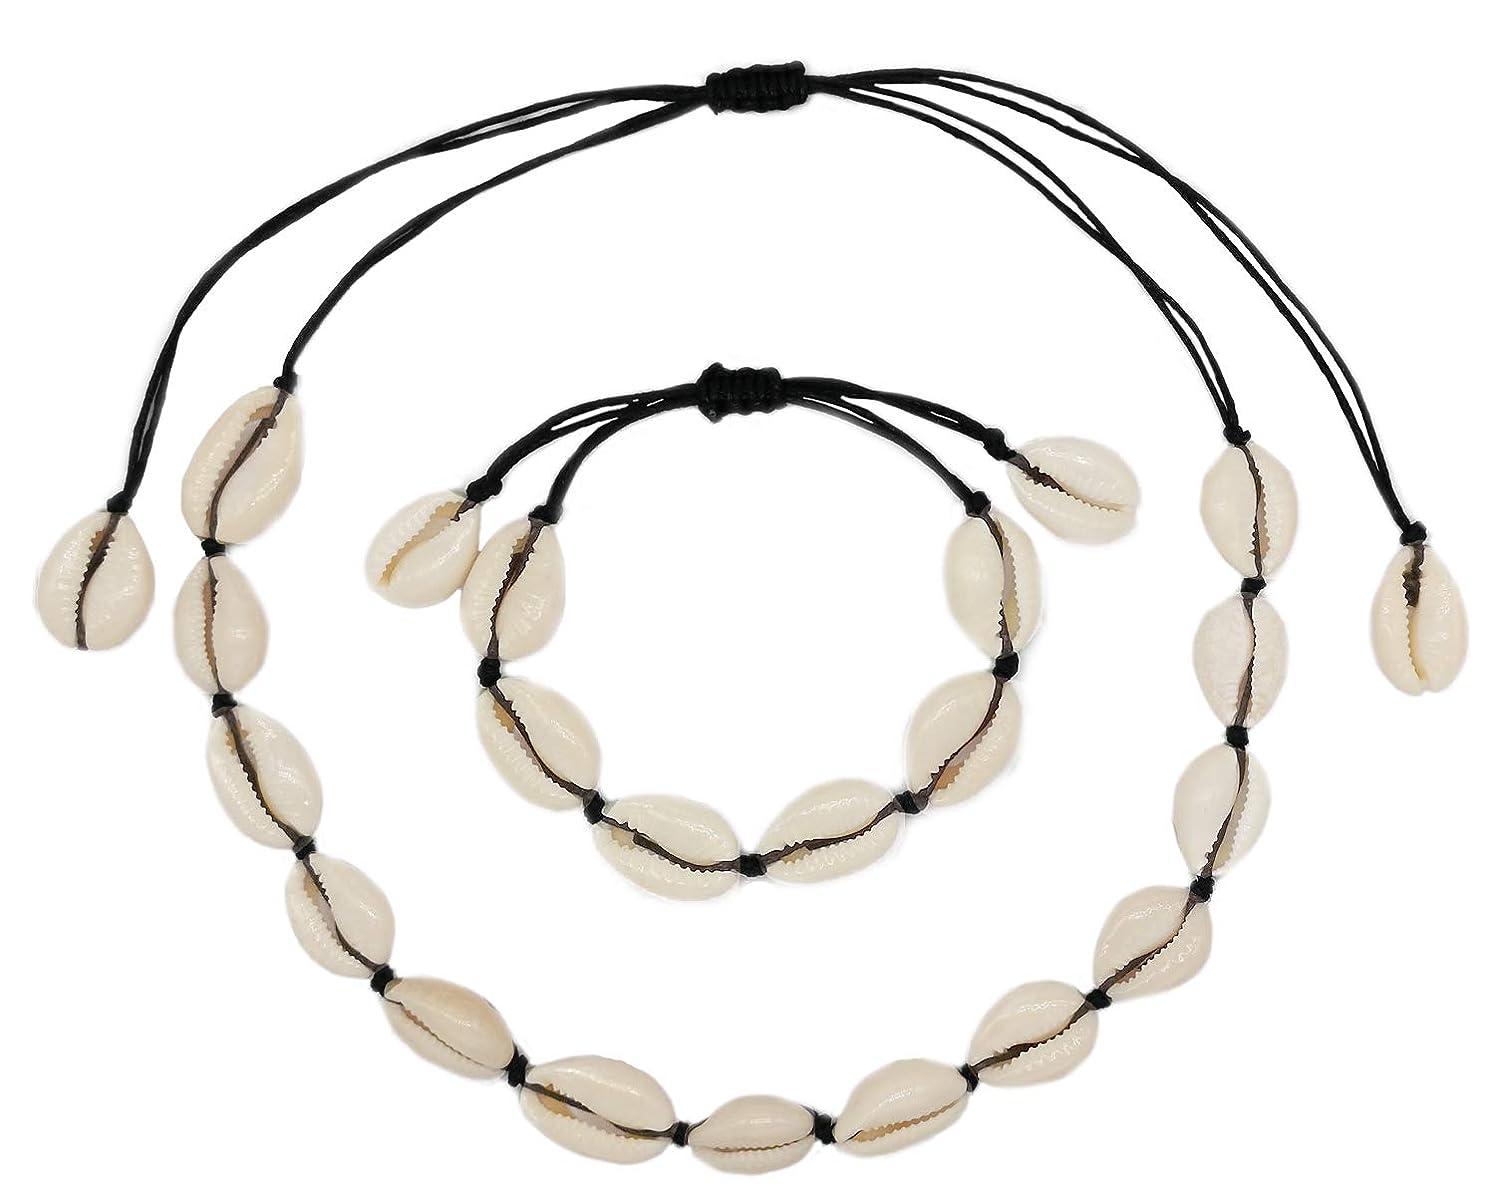 LOHZAQ Natural Sea Shell Beads Handmade Hawaii Wakiki Beach Choker Necklace Adjustable Bracelet Anklet for Girls Ladies